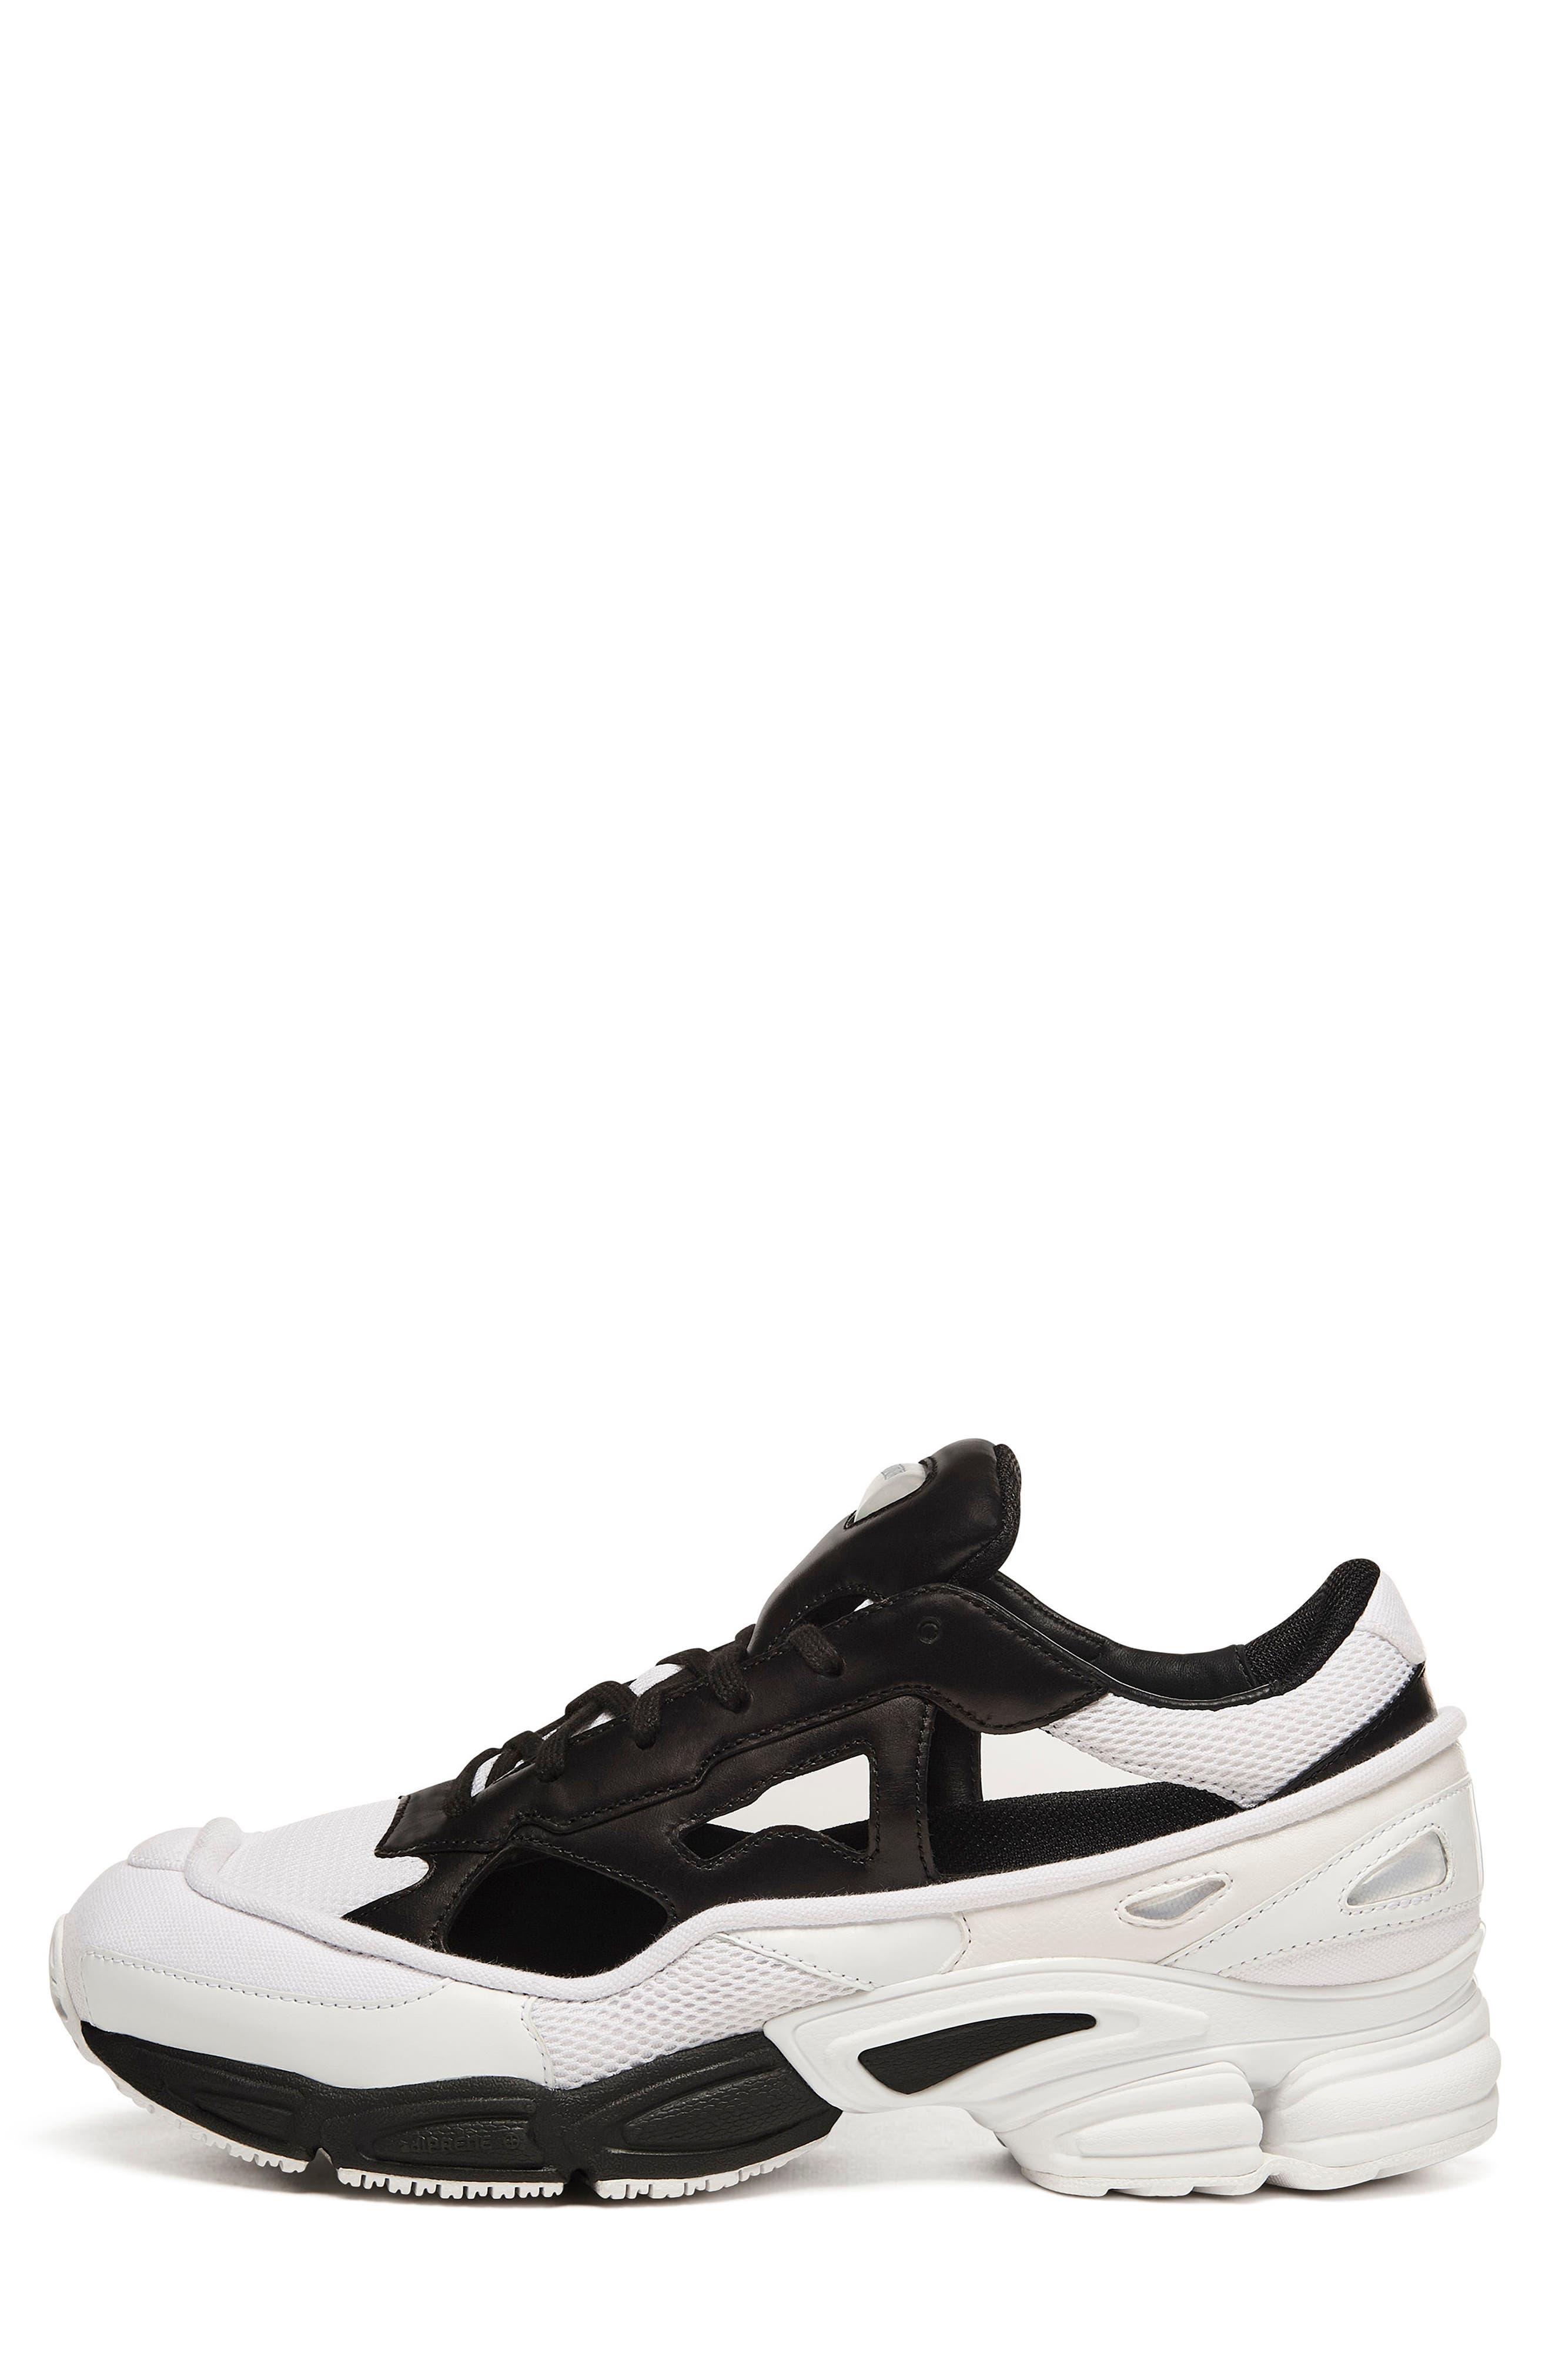 adidas x Raf Simons Replicant Ozweego Sneaker (Women)